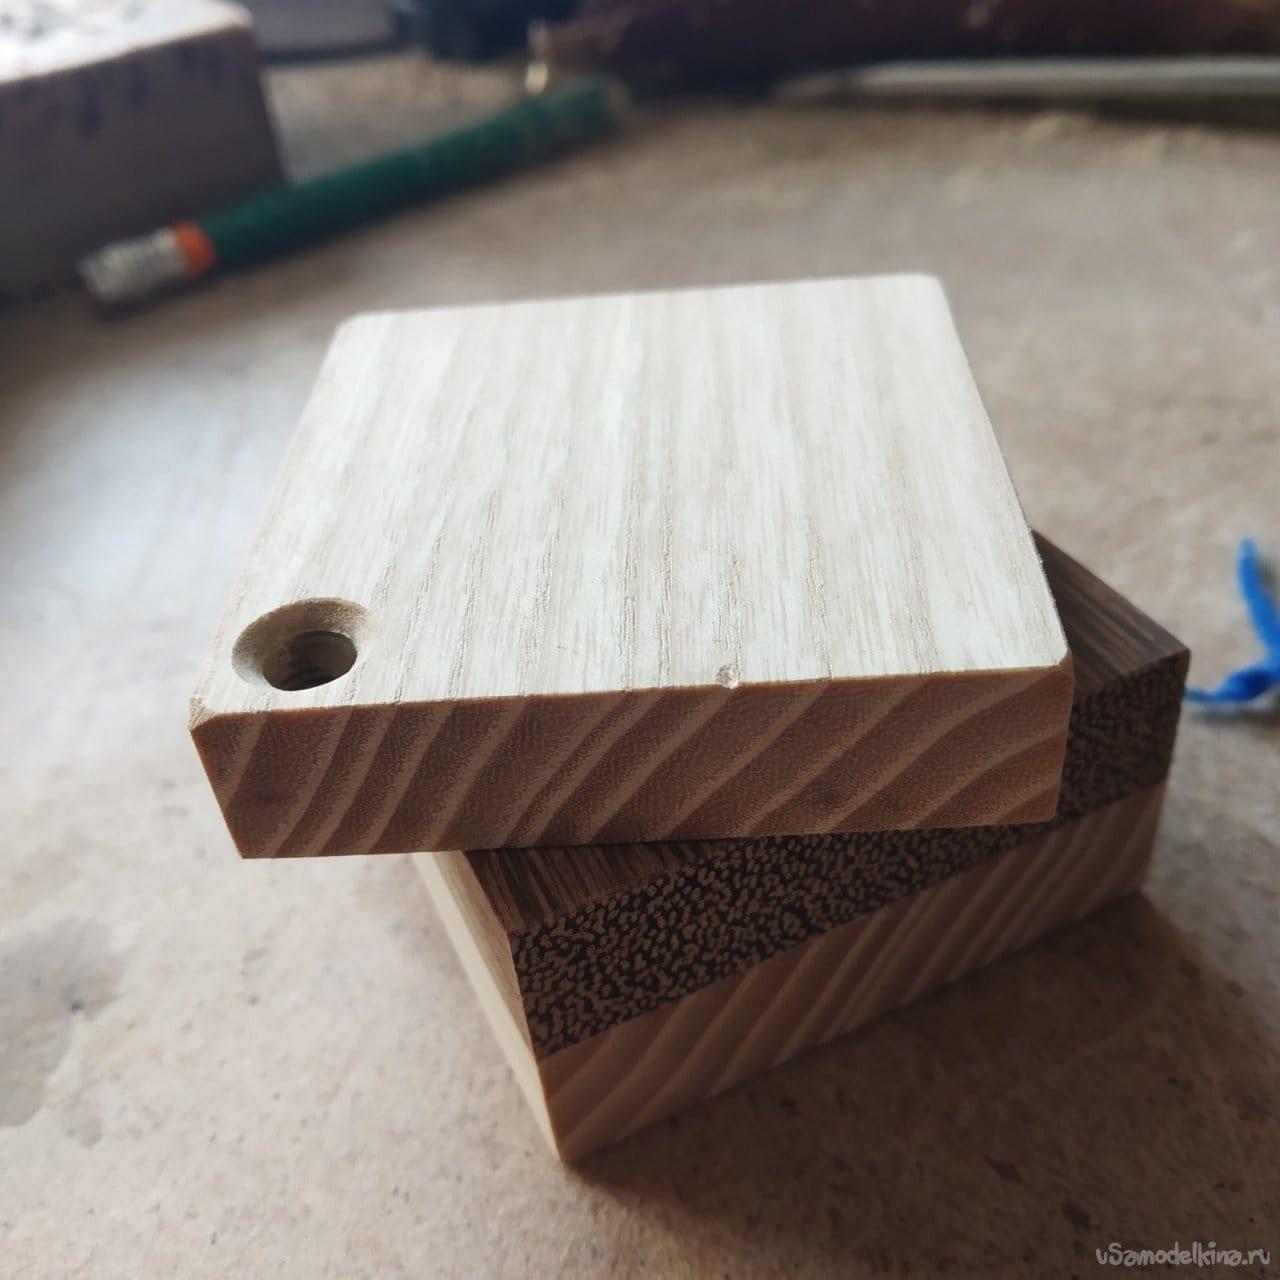 Box made of wood (ash and sucupira)